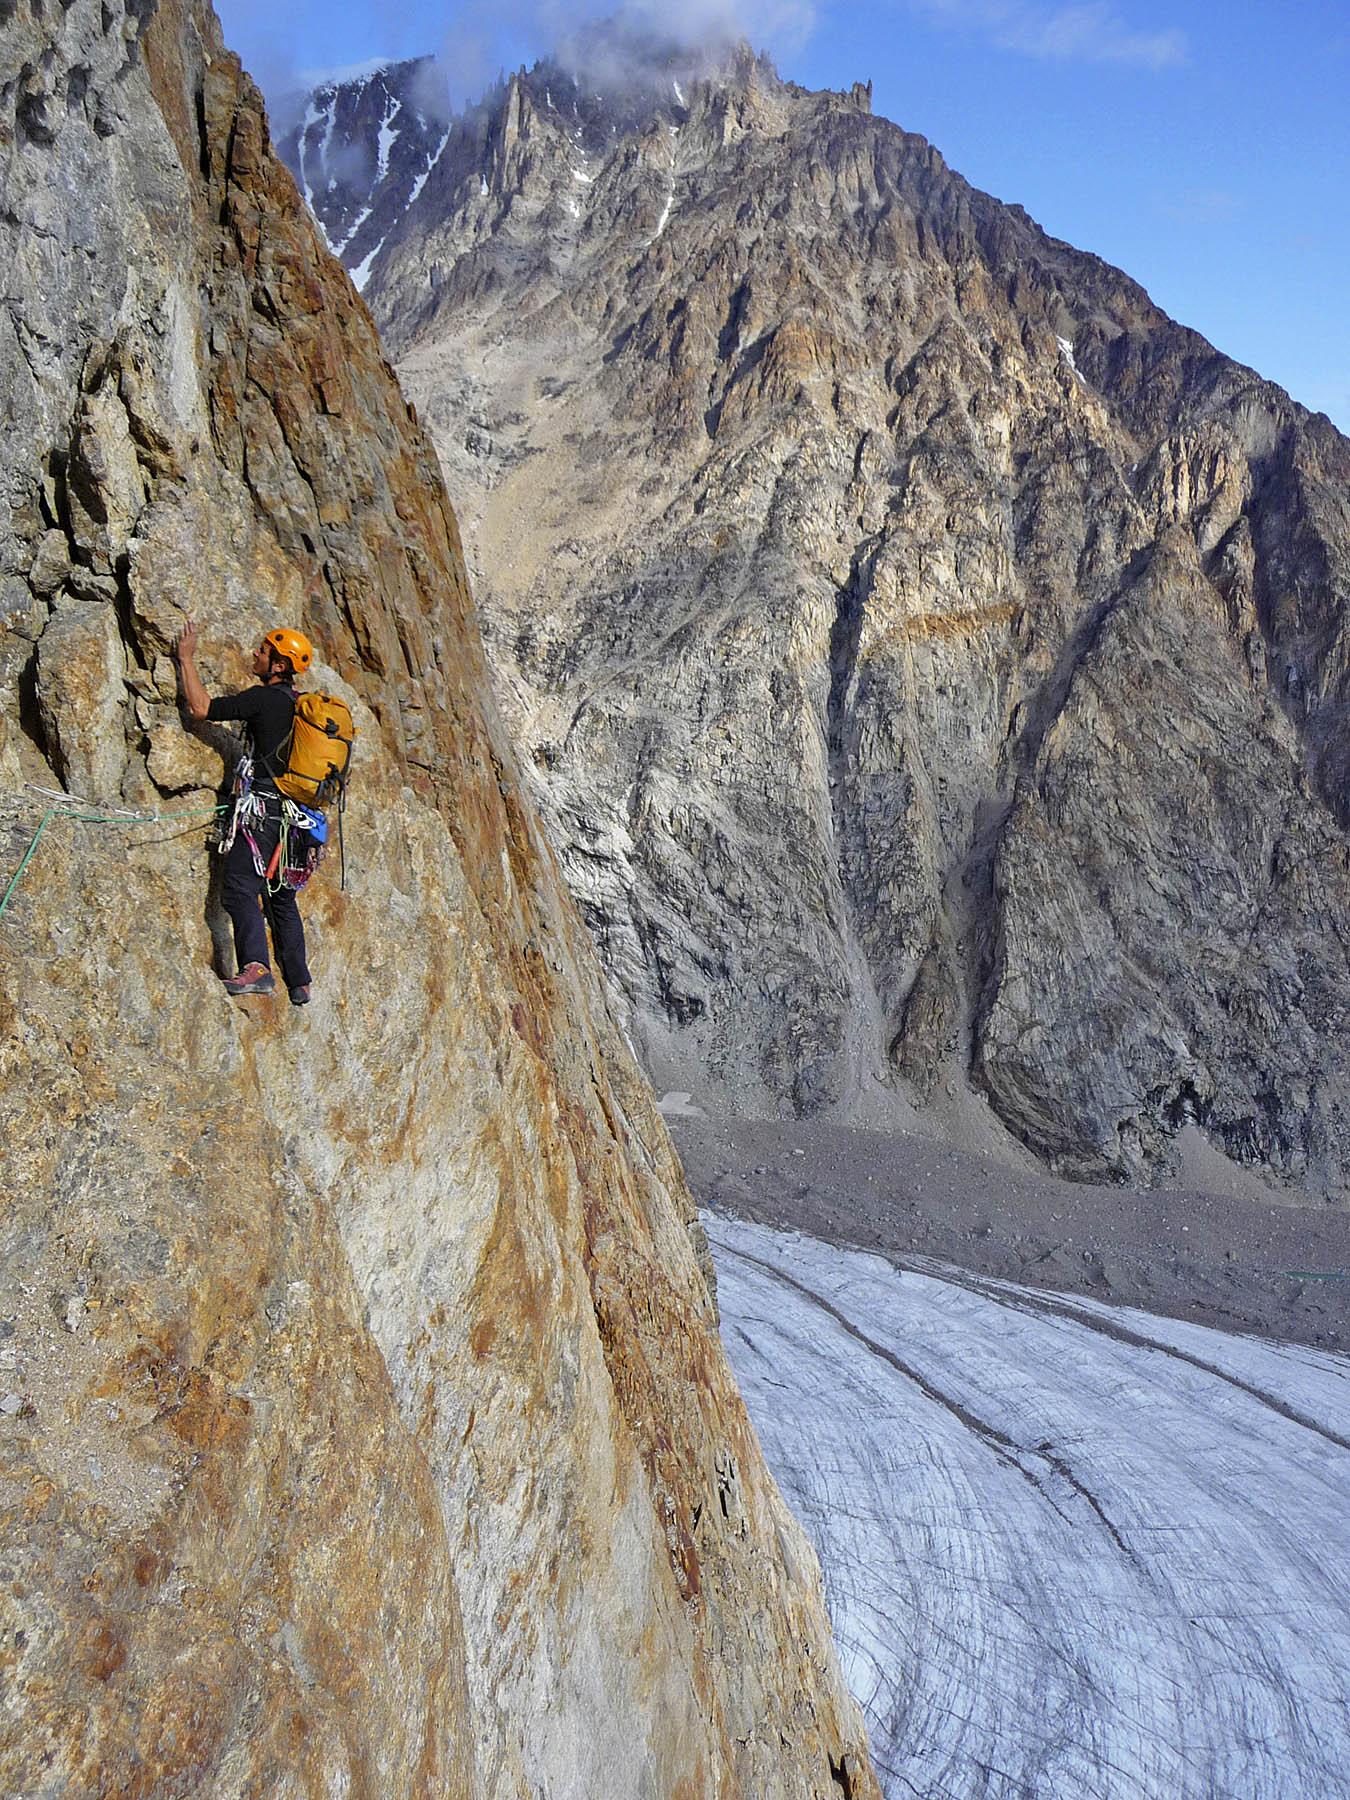 Niek de Jonge on the First Ascent Route, The Cenotaph. Below is the Apusinikajik Glacier.